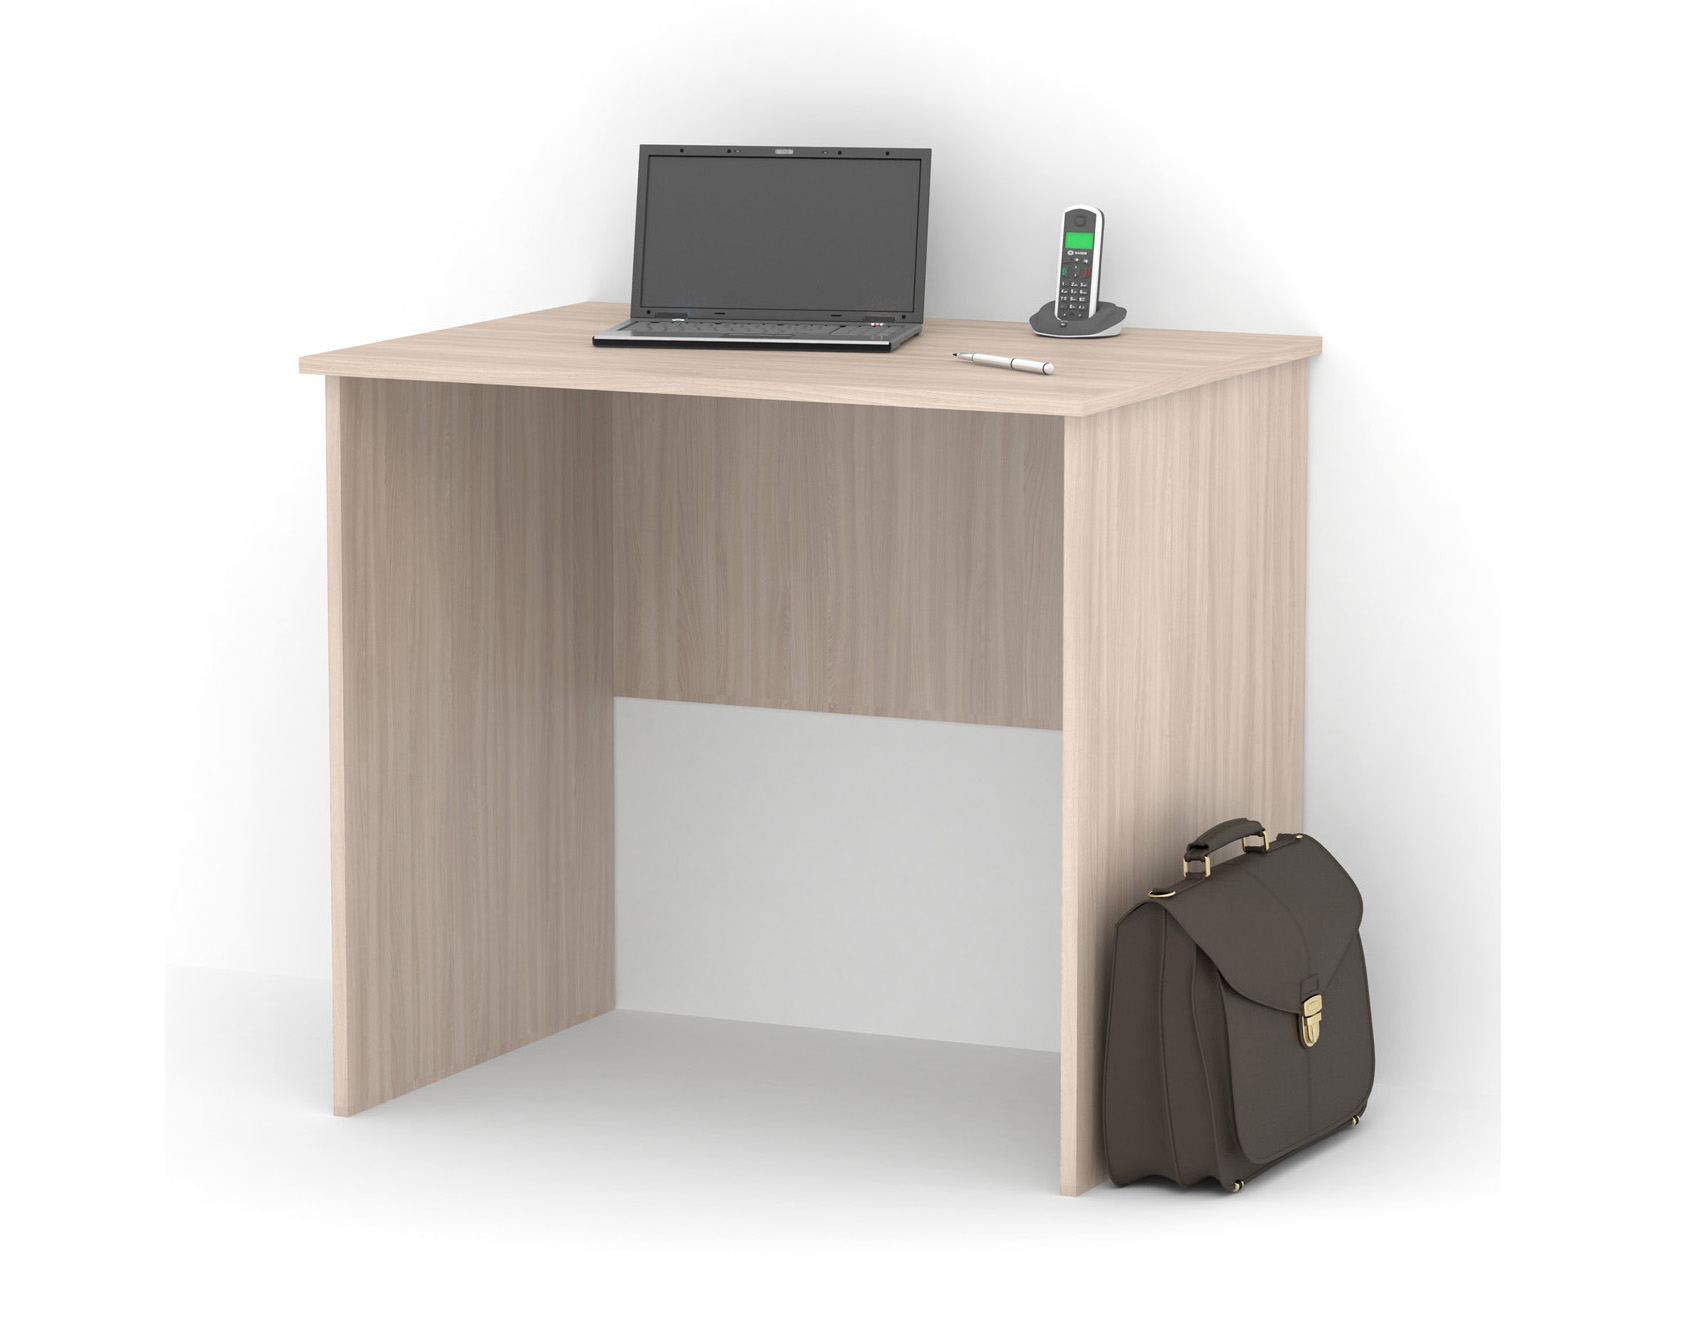 Компьютерный стол Квант 800-1200 компьютерный стол кс 20 30